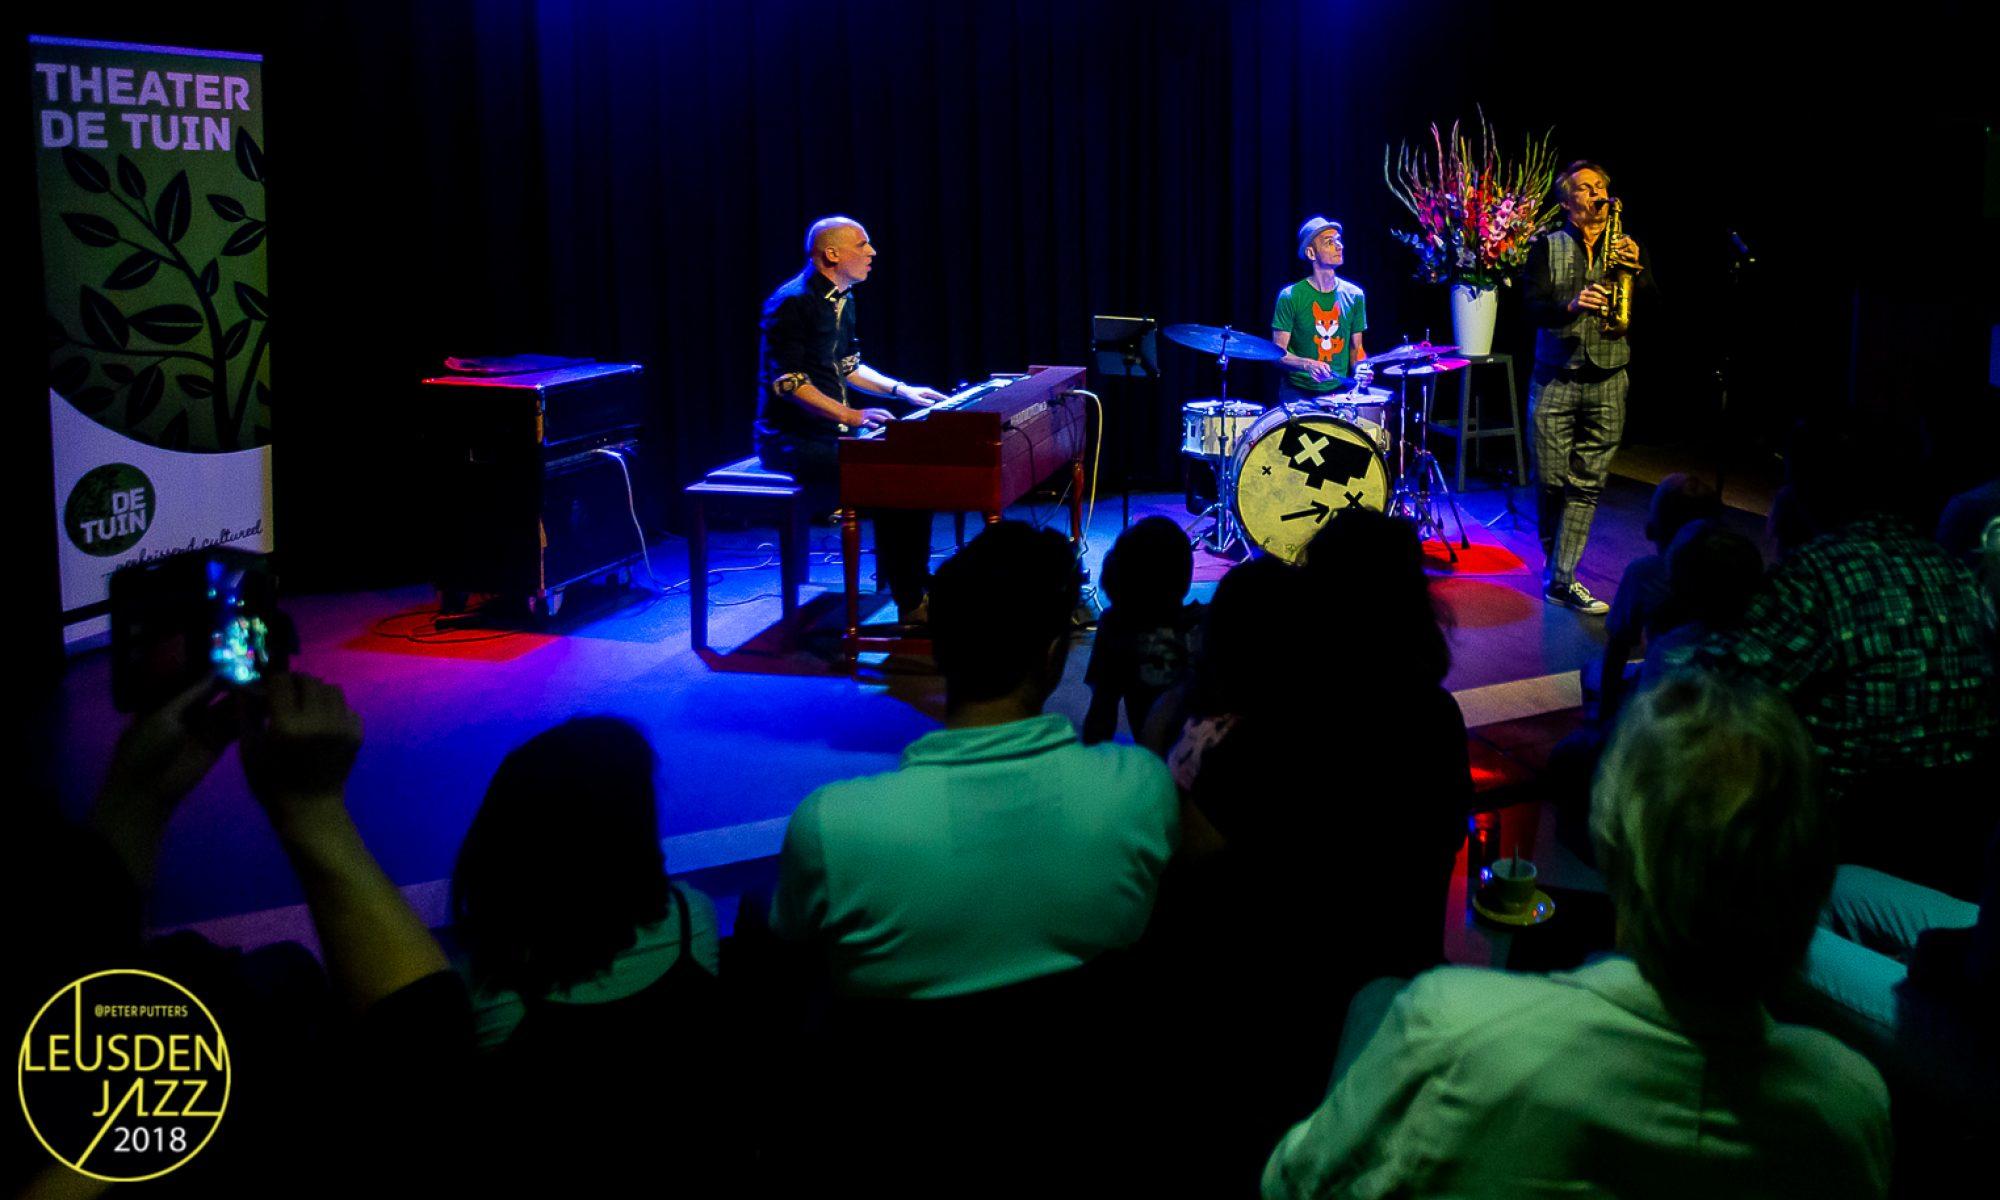 Leusden Jazz